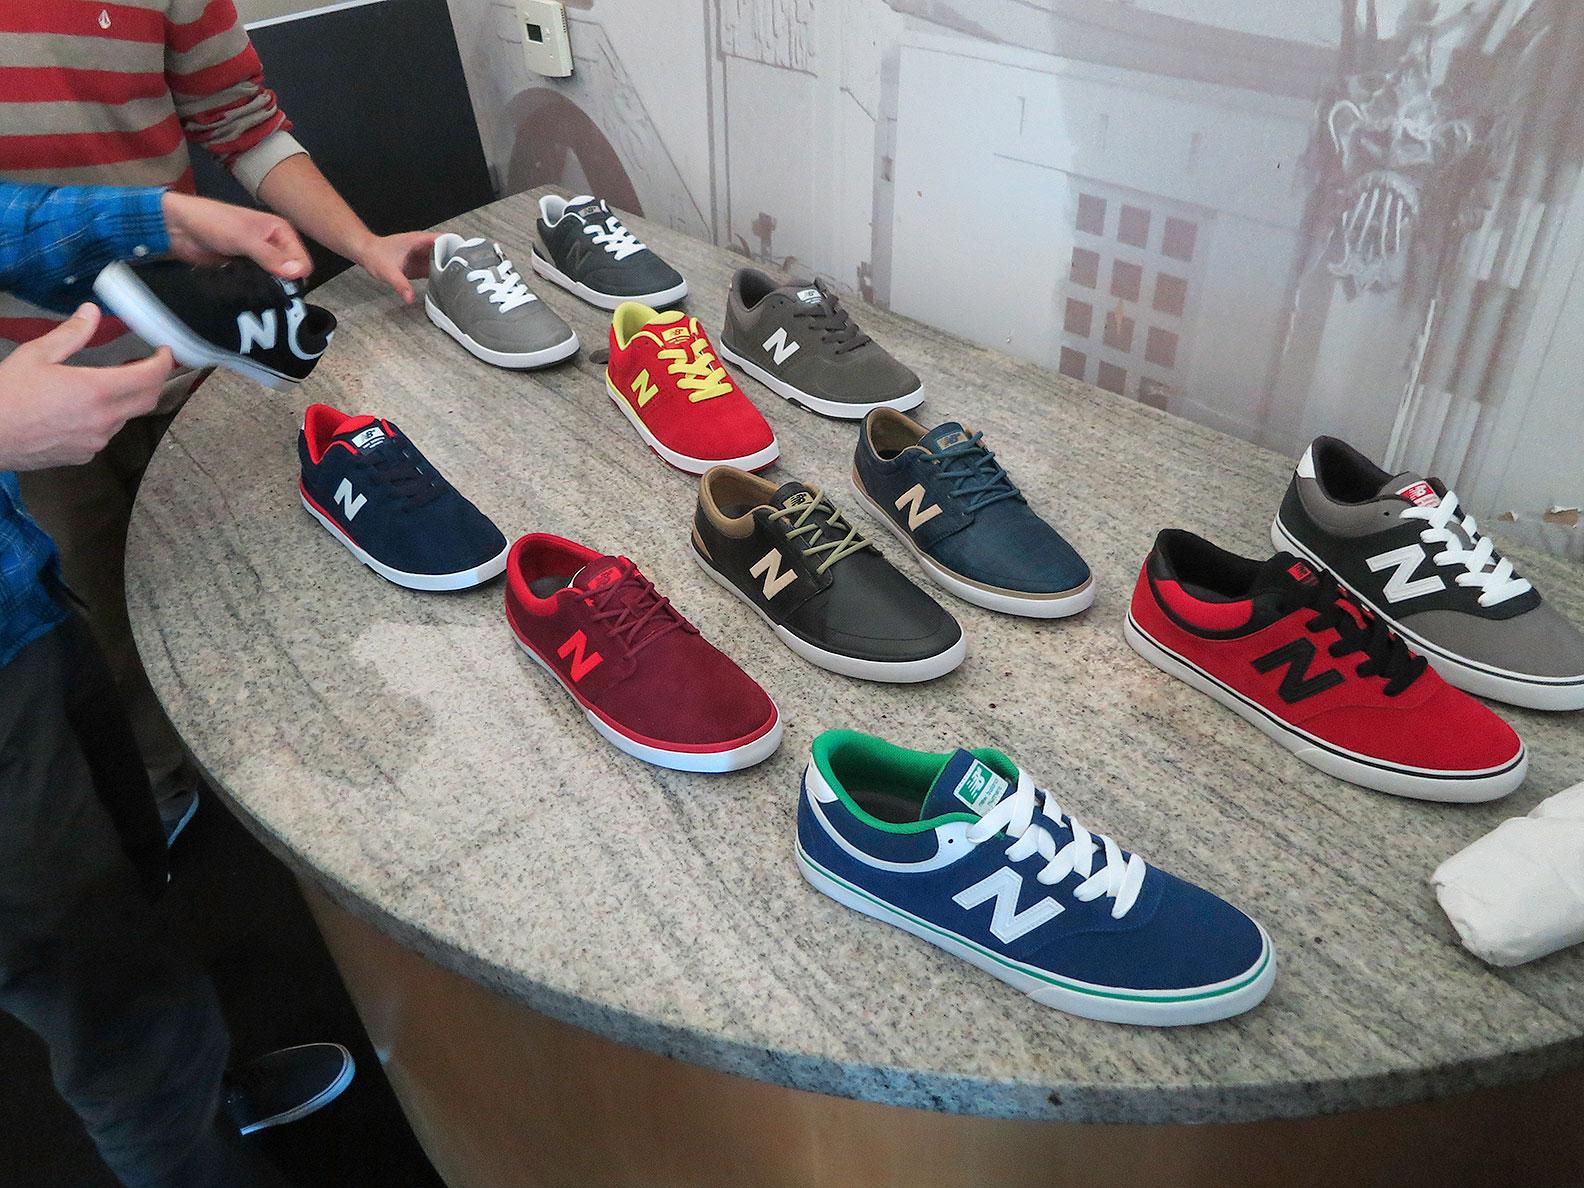 comprar zapatillas new balance en chile